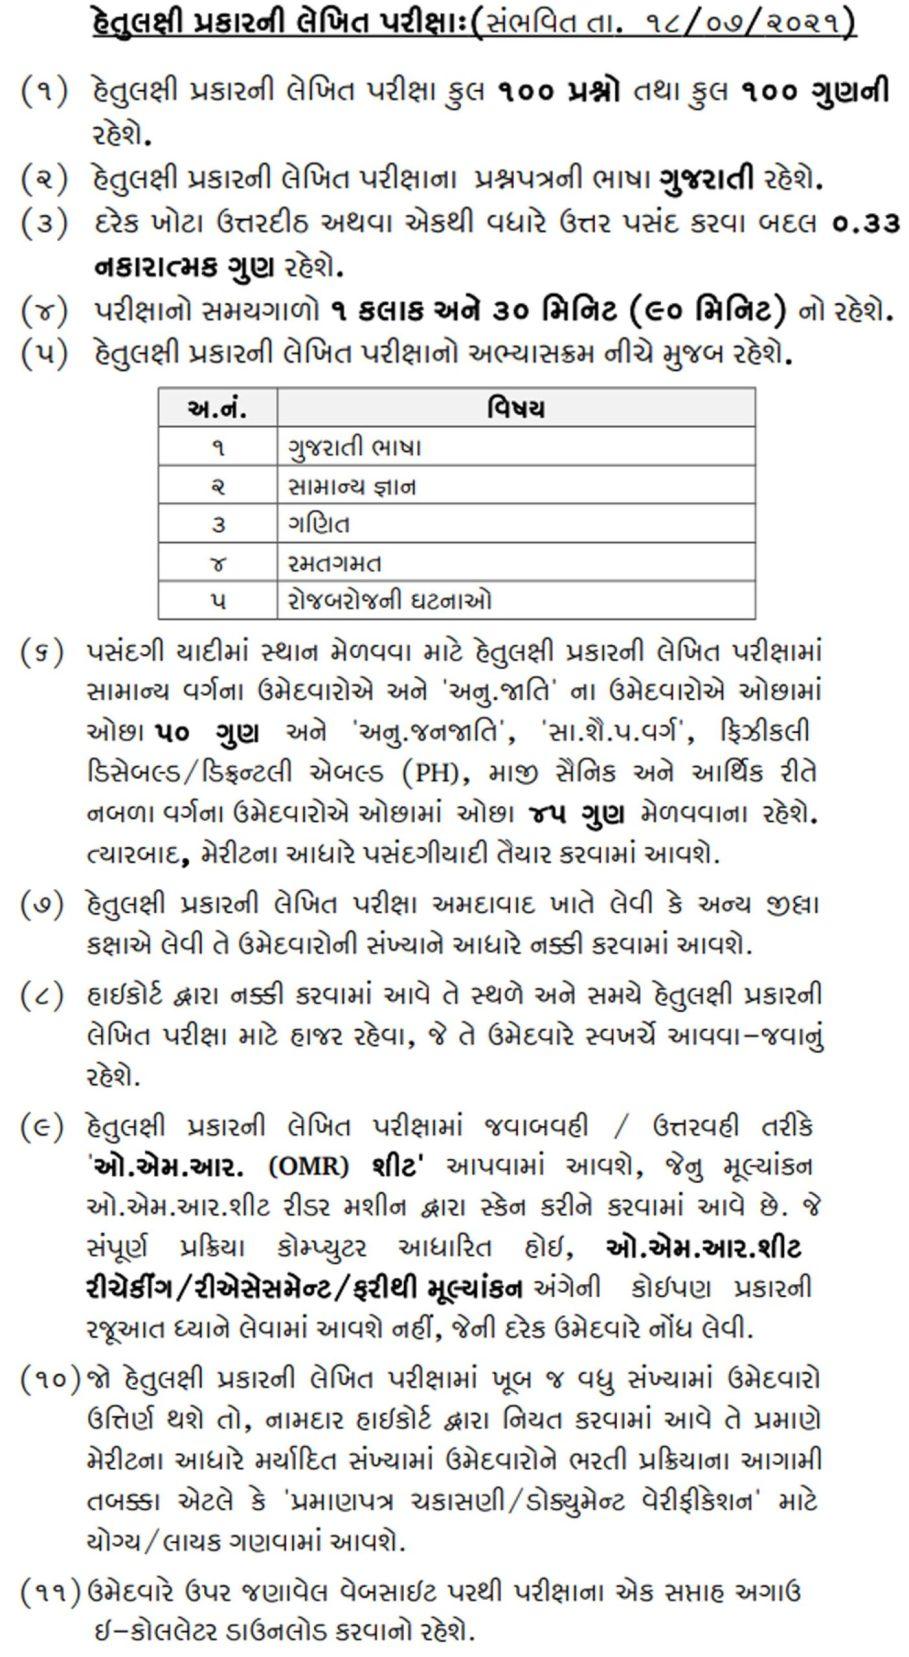 Gujarat High Court Attendant Exam Pattern & Syllabus 2021